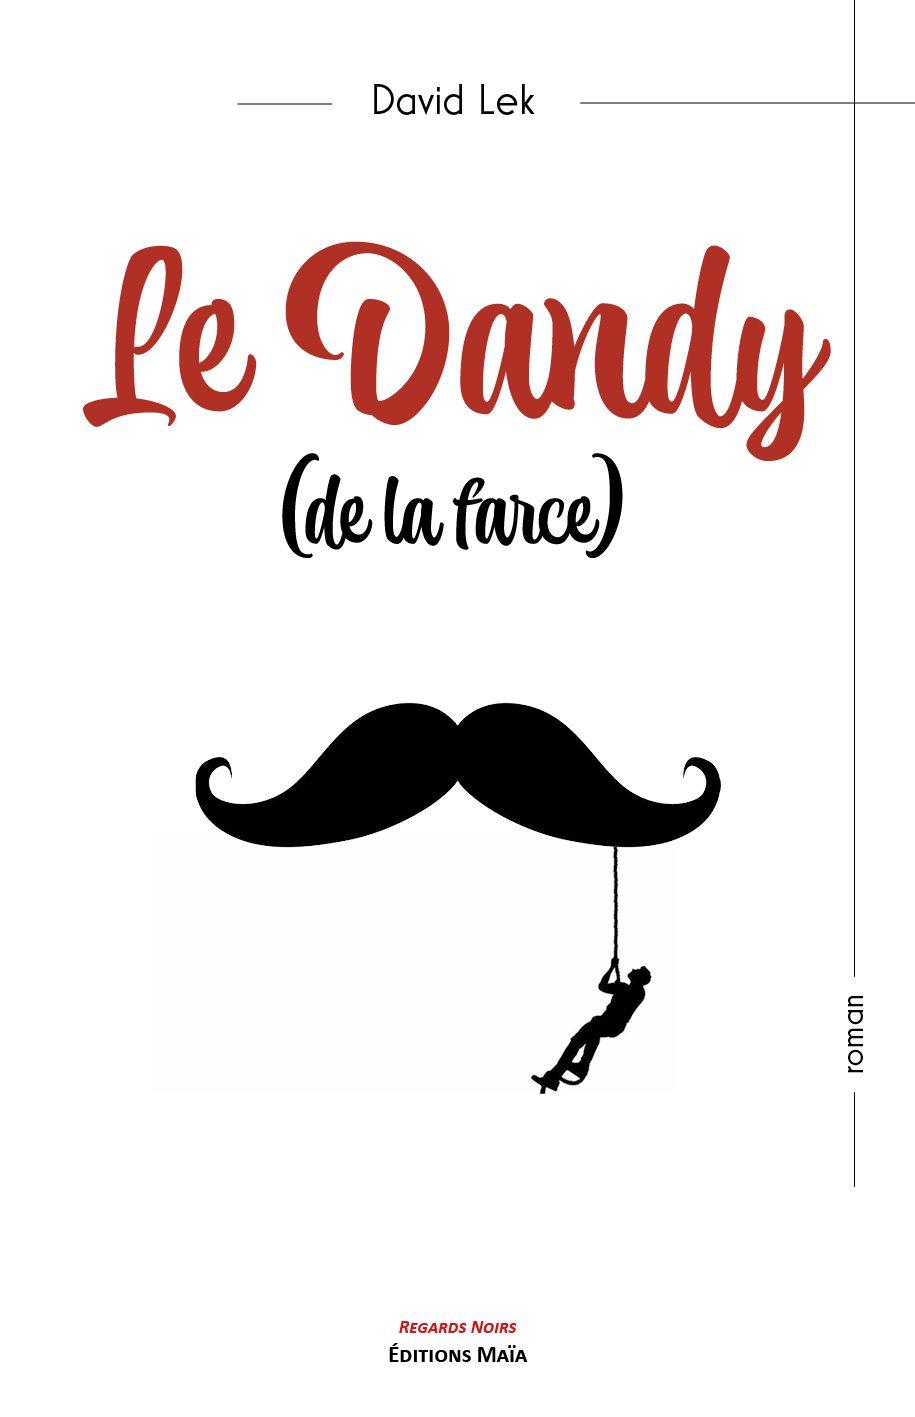 Entretien avec David Lek – Le Dandy (de la farce)